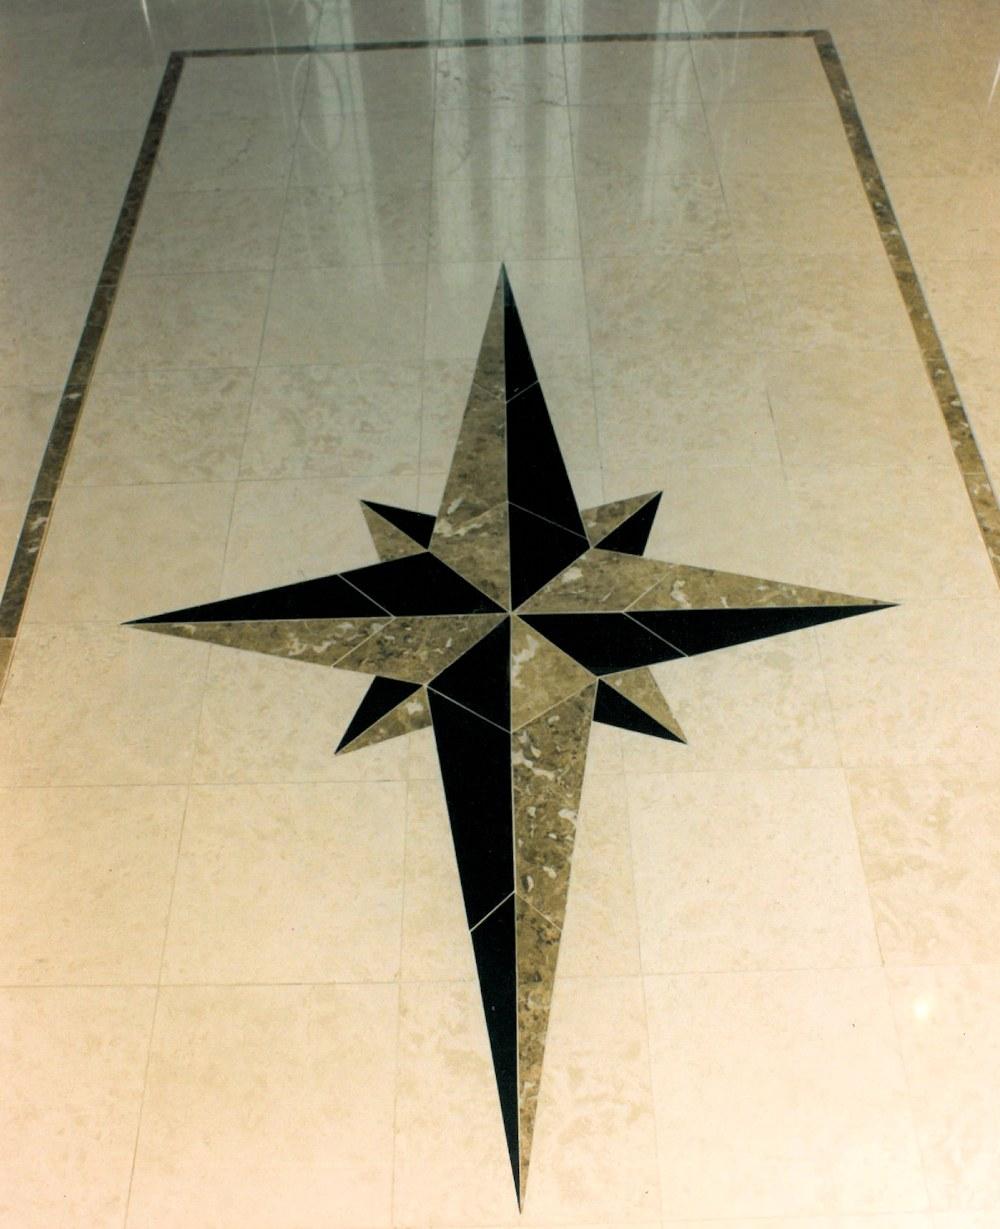 Oregon Dream 1995 - Marble Medallion in Entry Hall Floor - Bernard Custom Homes - Street of Dreams.